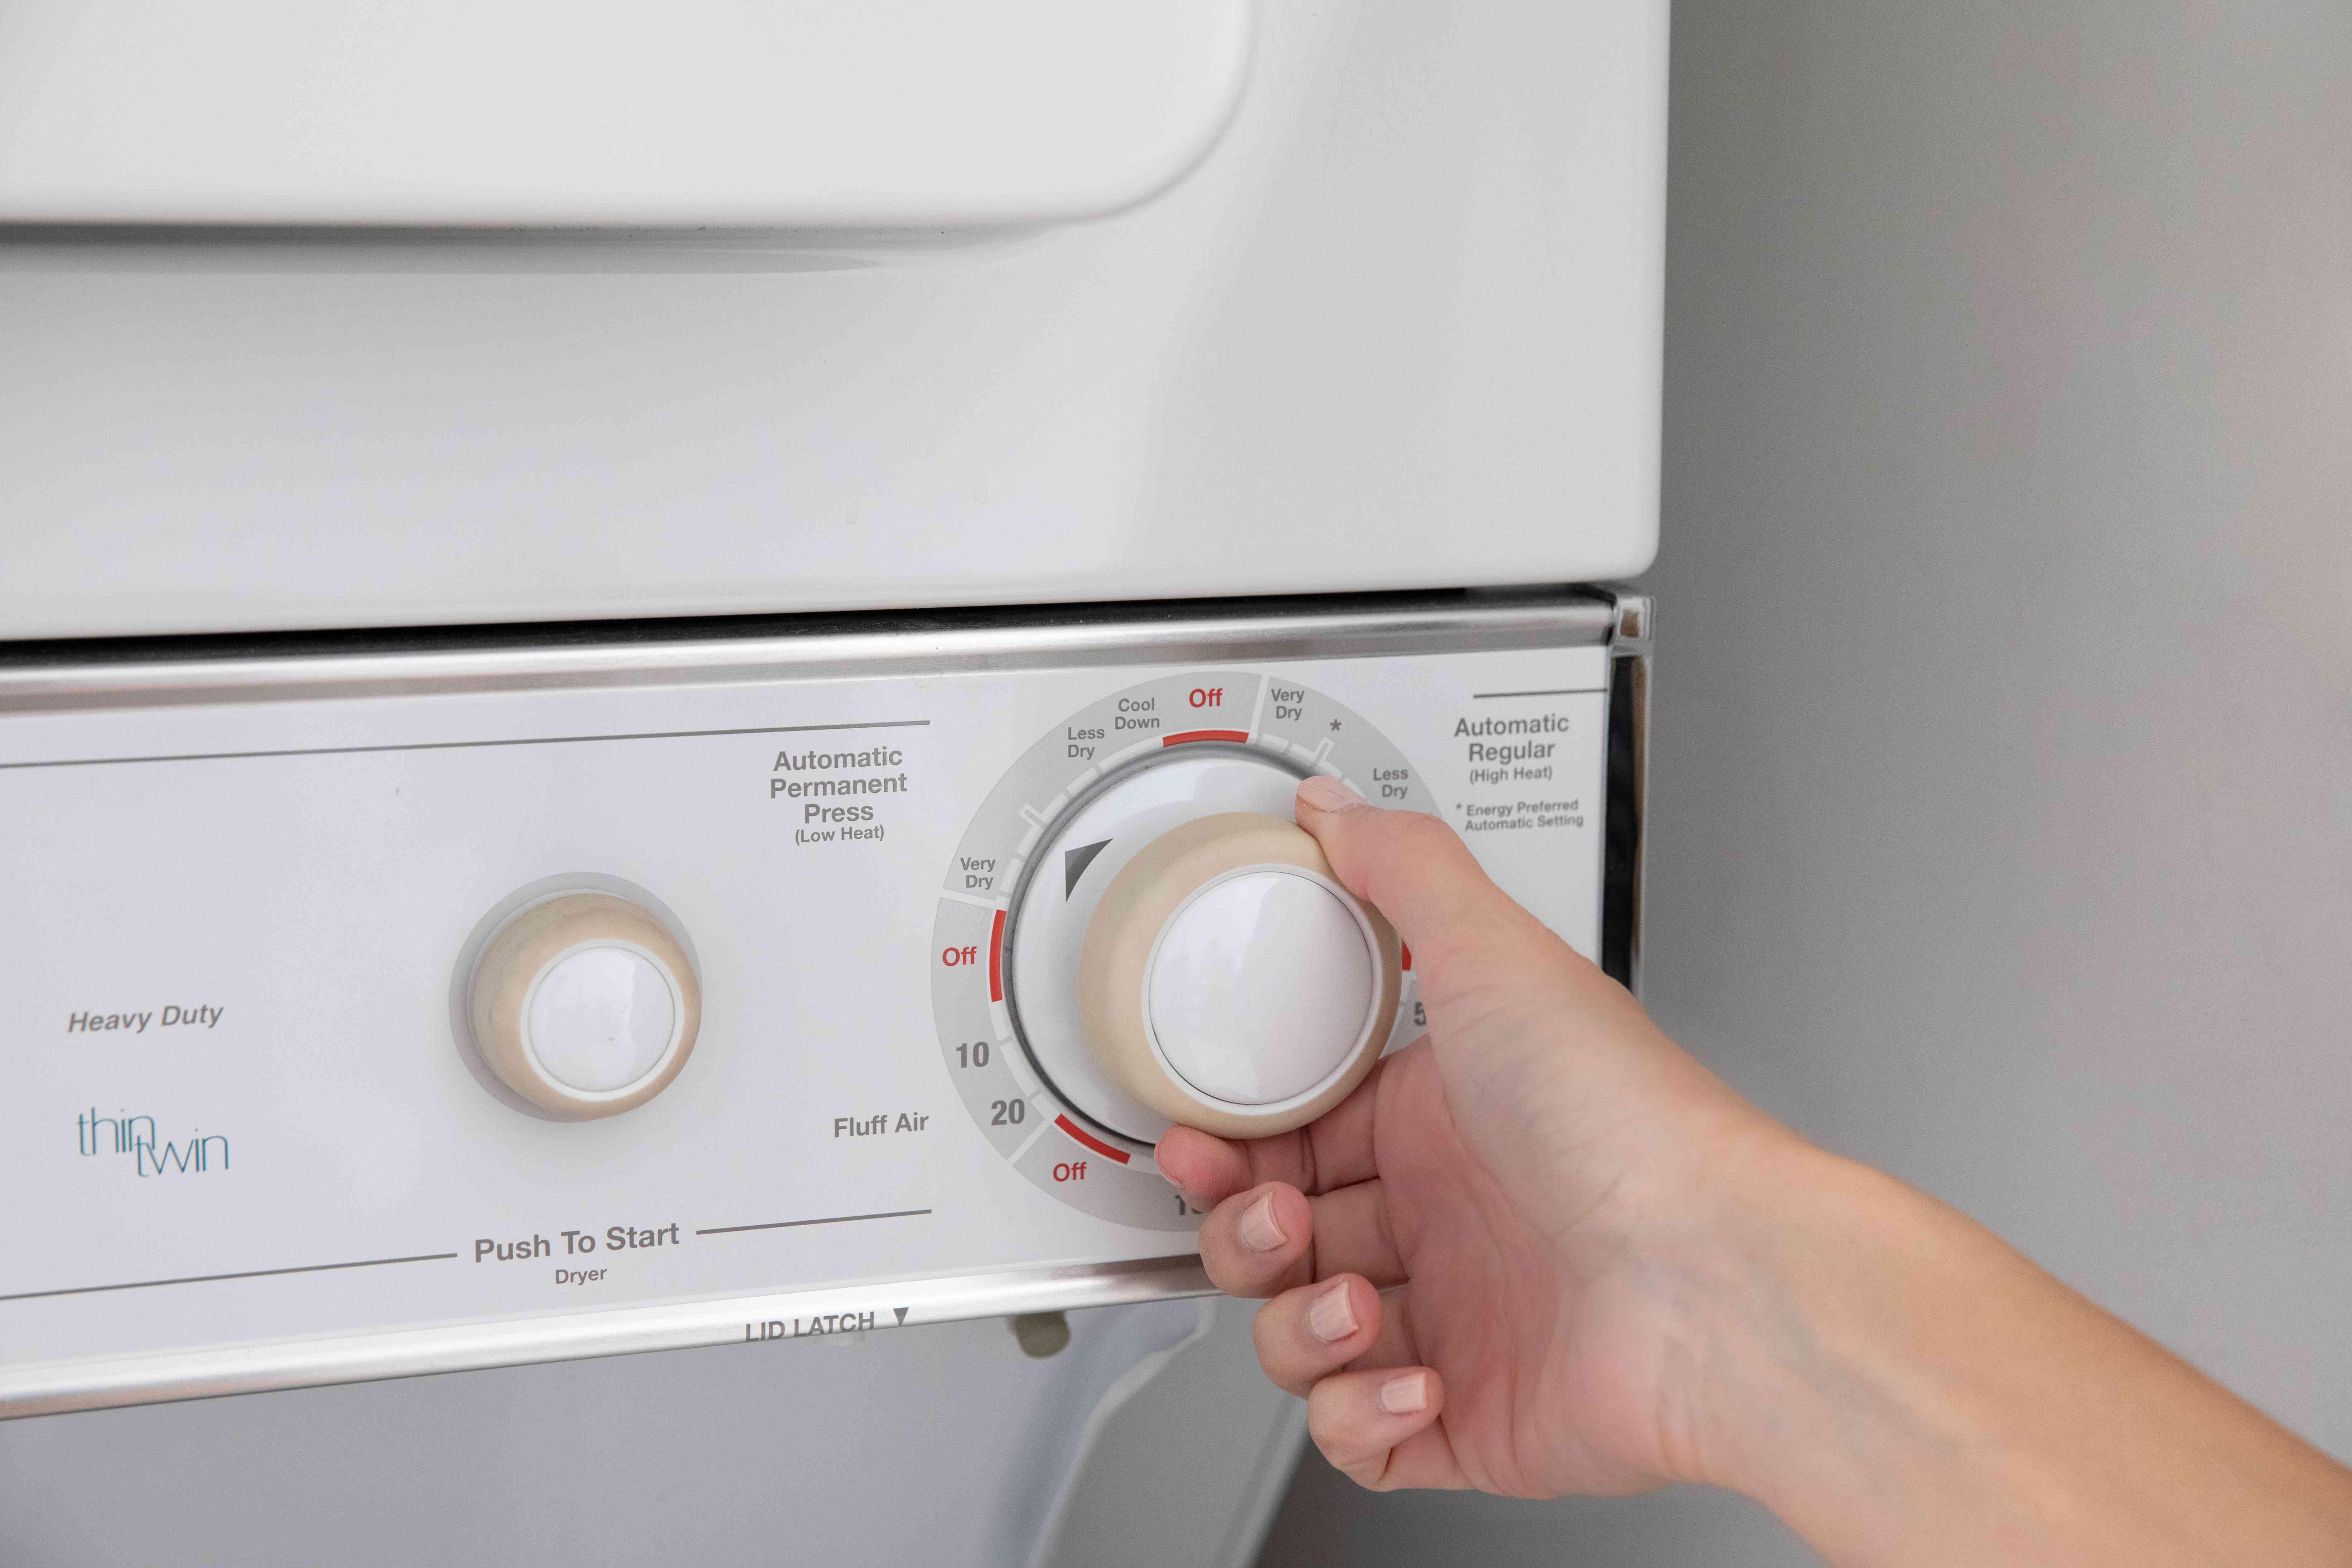 Drying machine set to tumble dry low